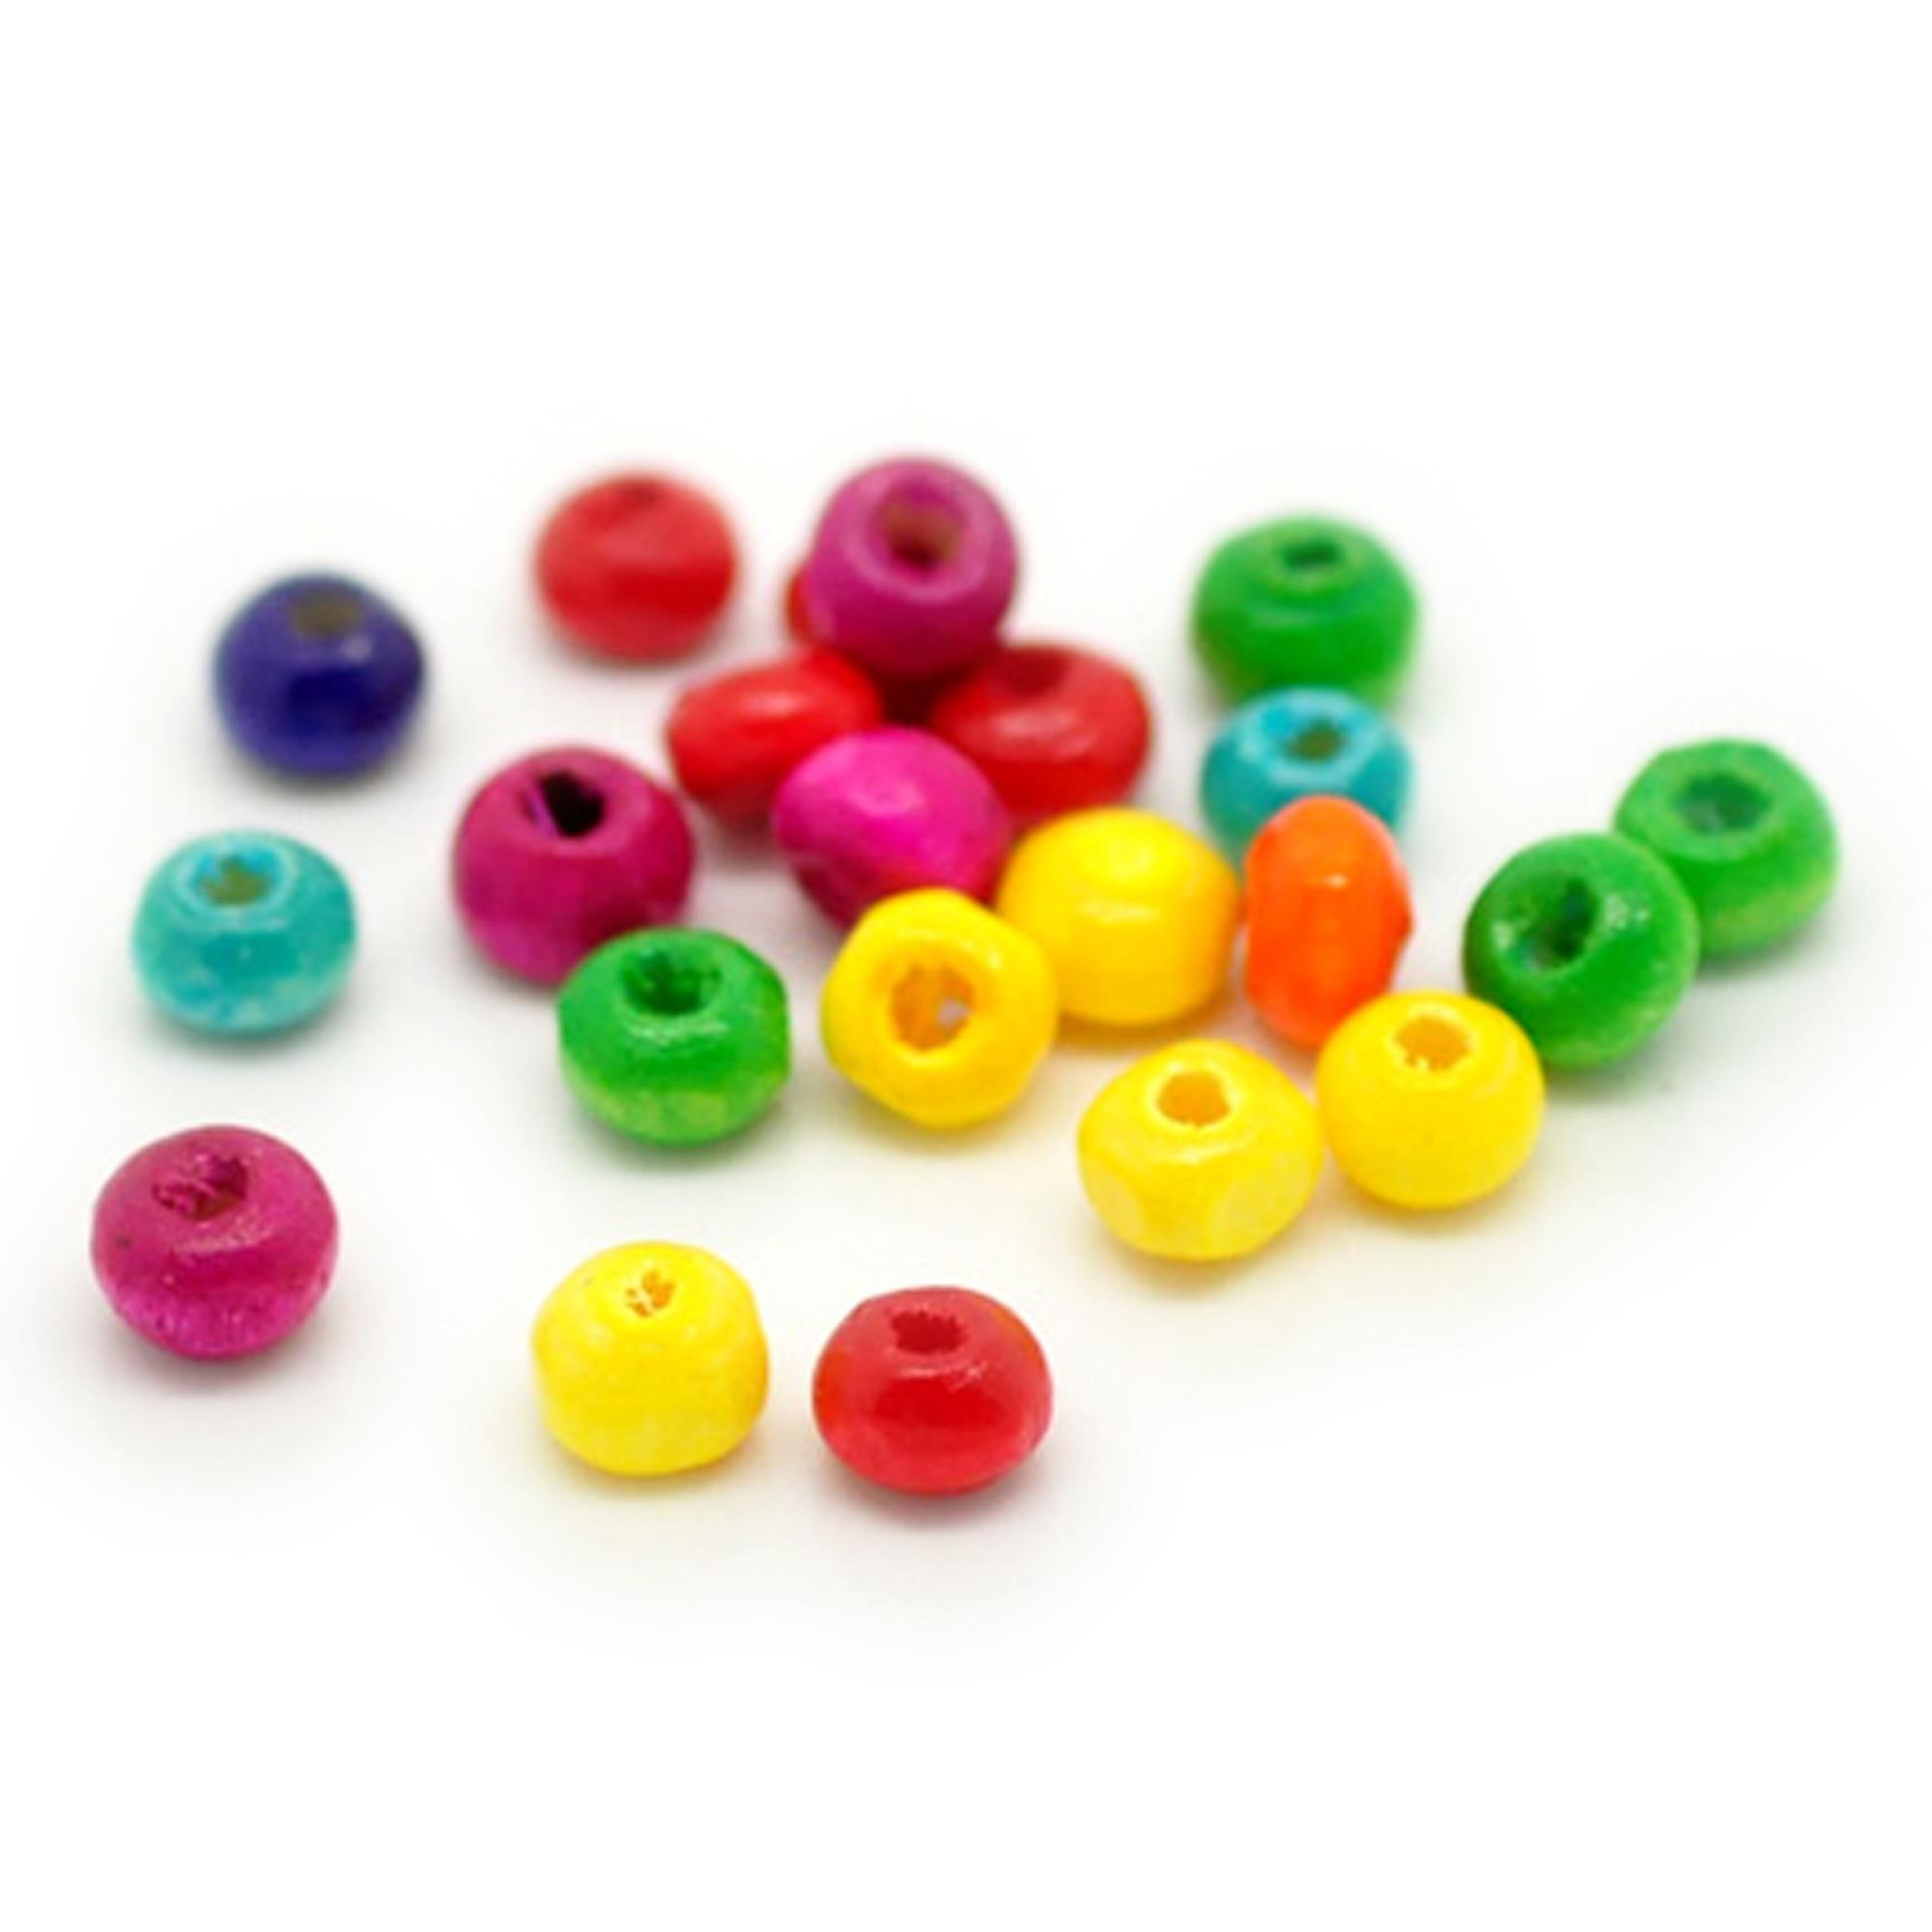 200 Mix Bunt Würfel Zahl Holz Perlen Beads 10x9mm